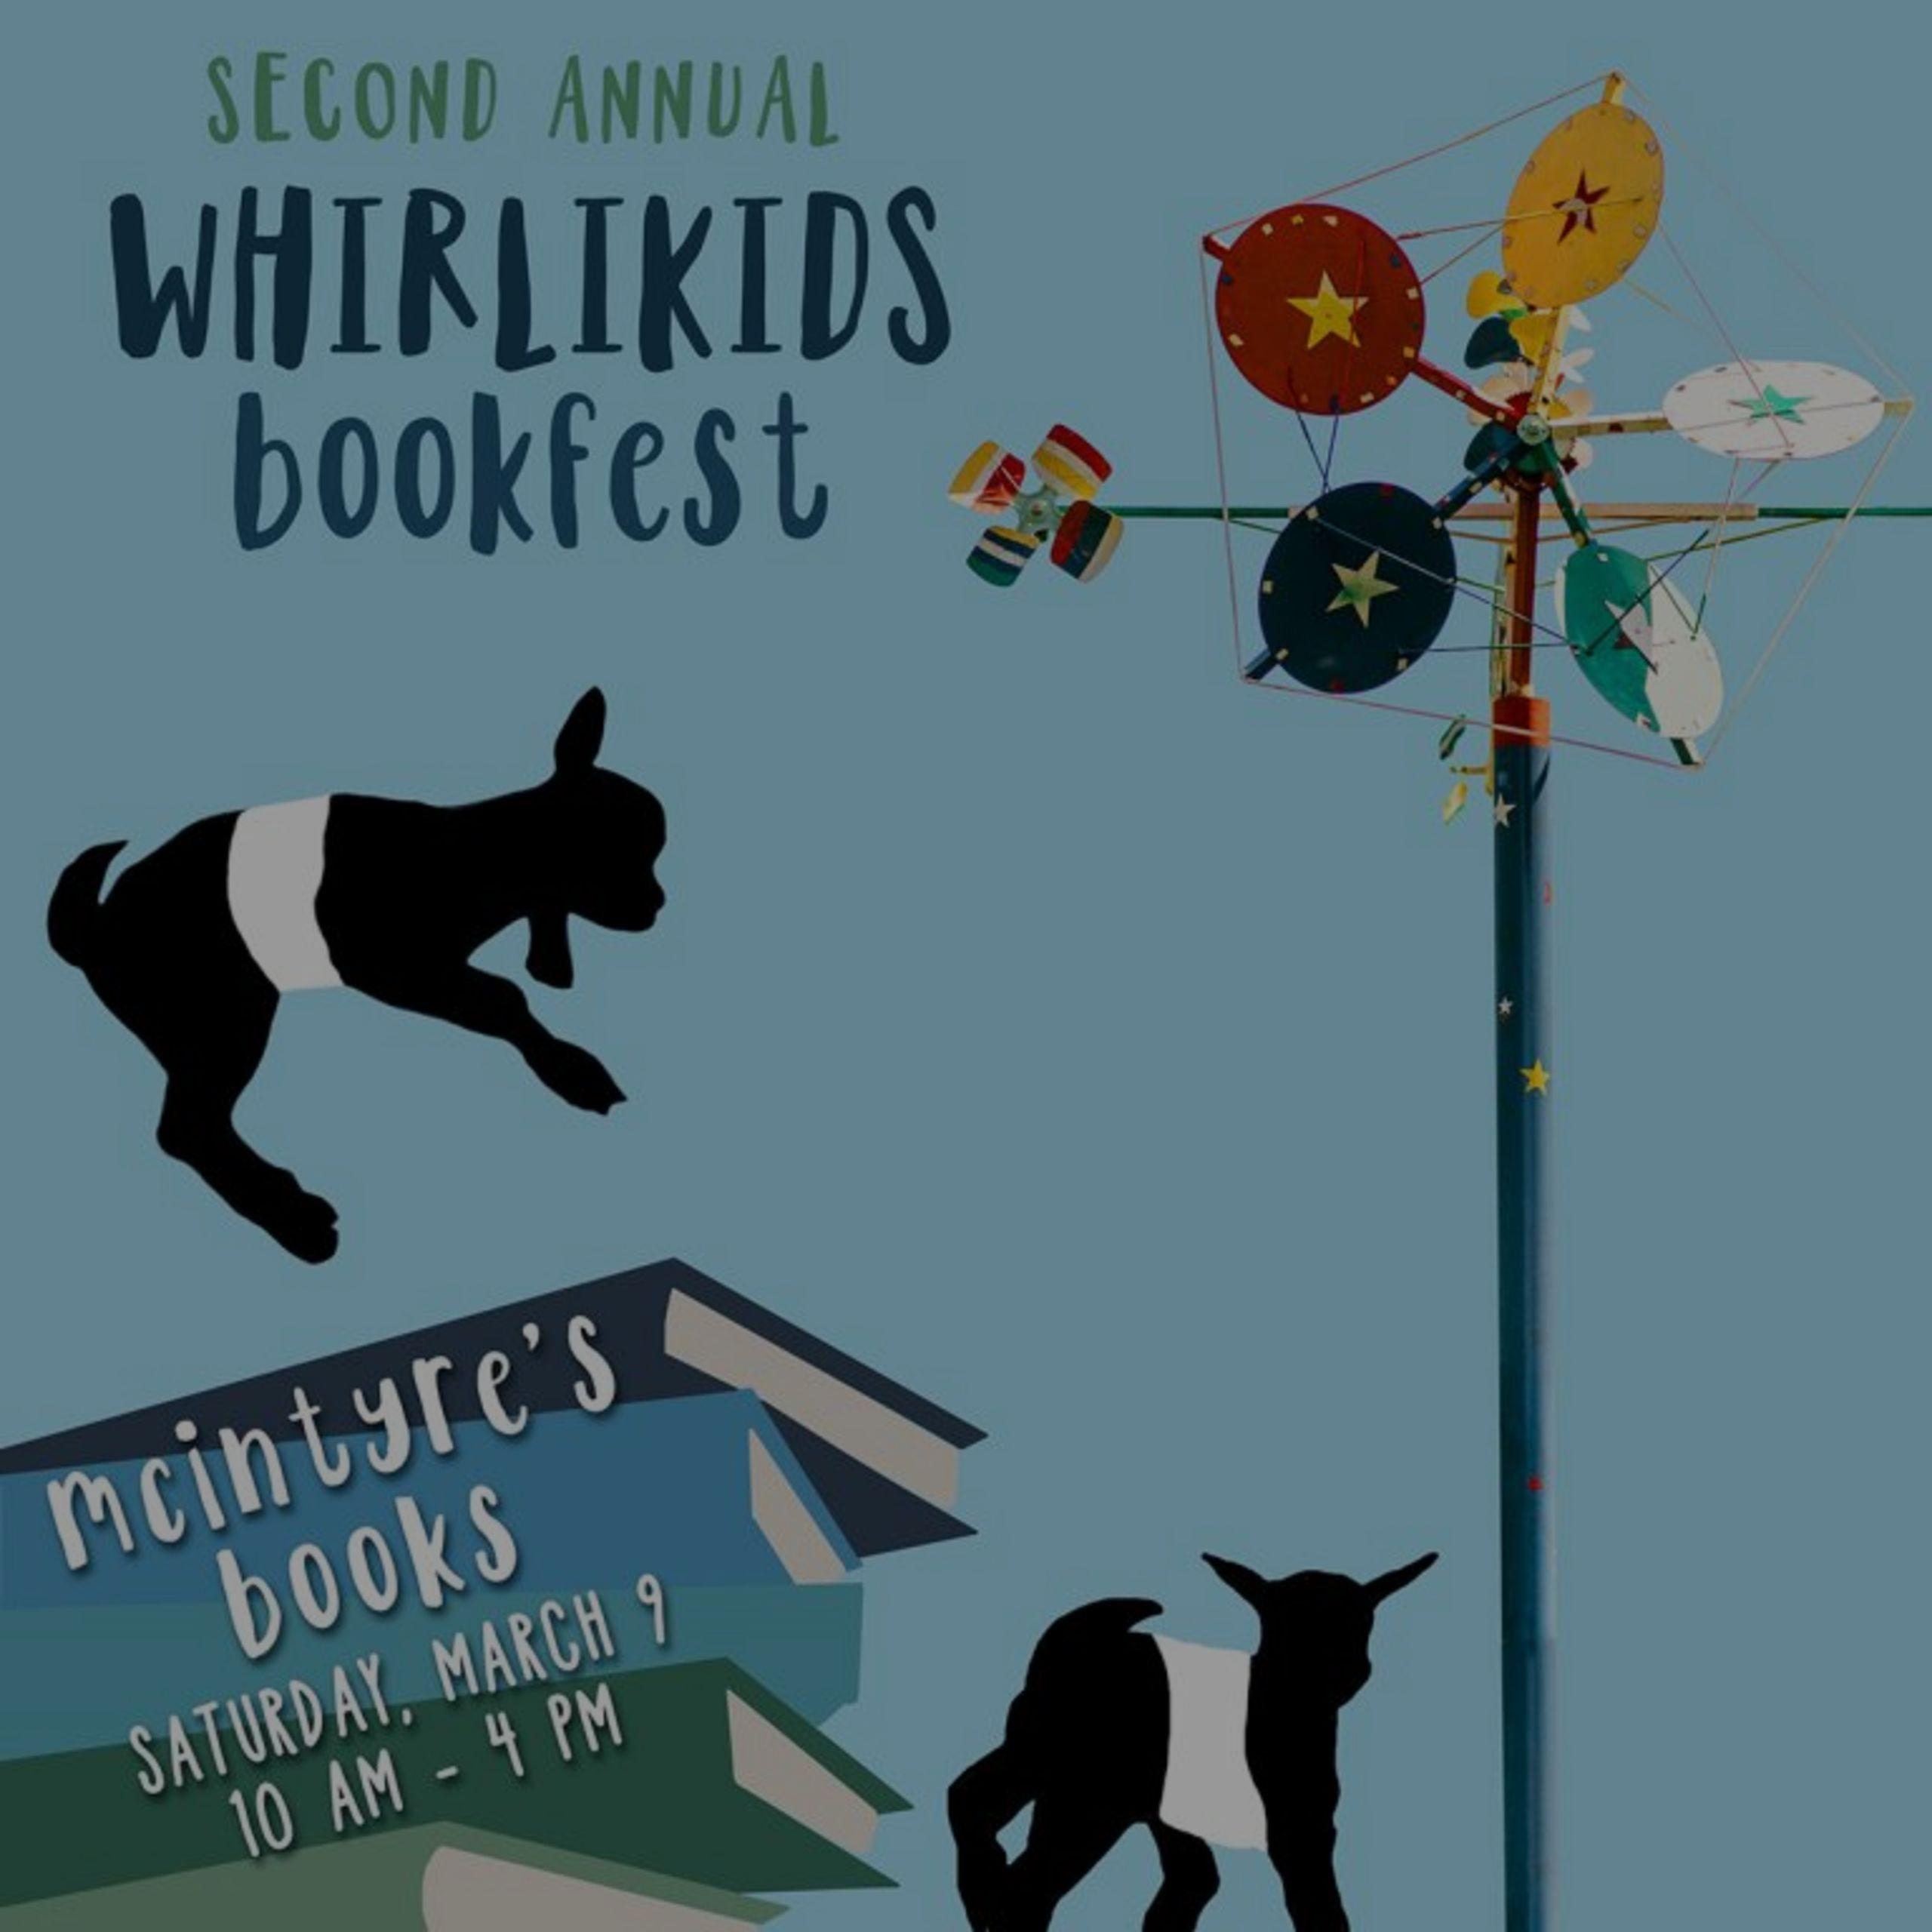 WhirliKids Book Festival – Fearrington Village